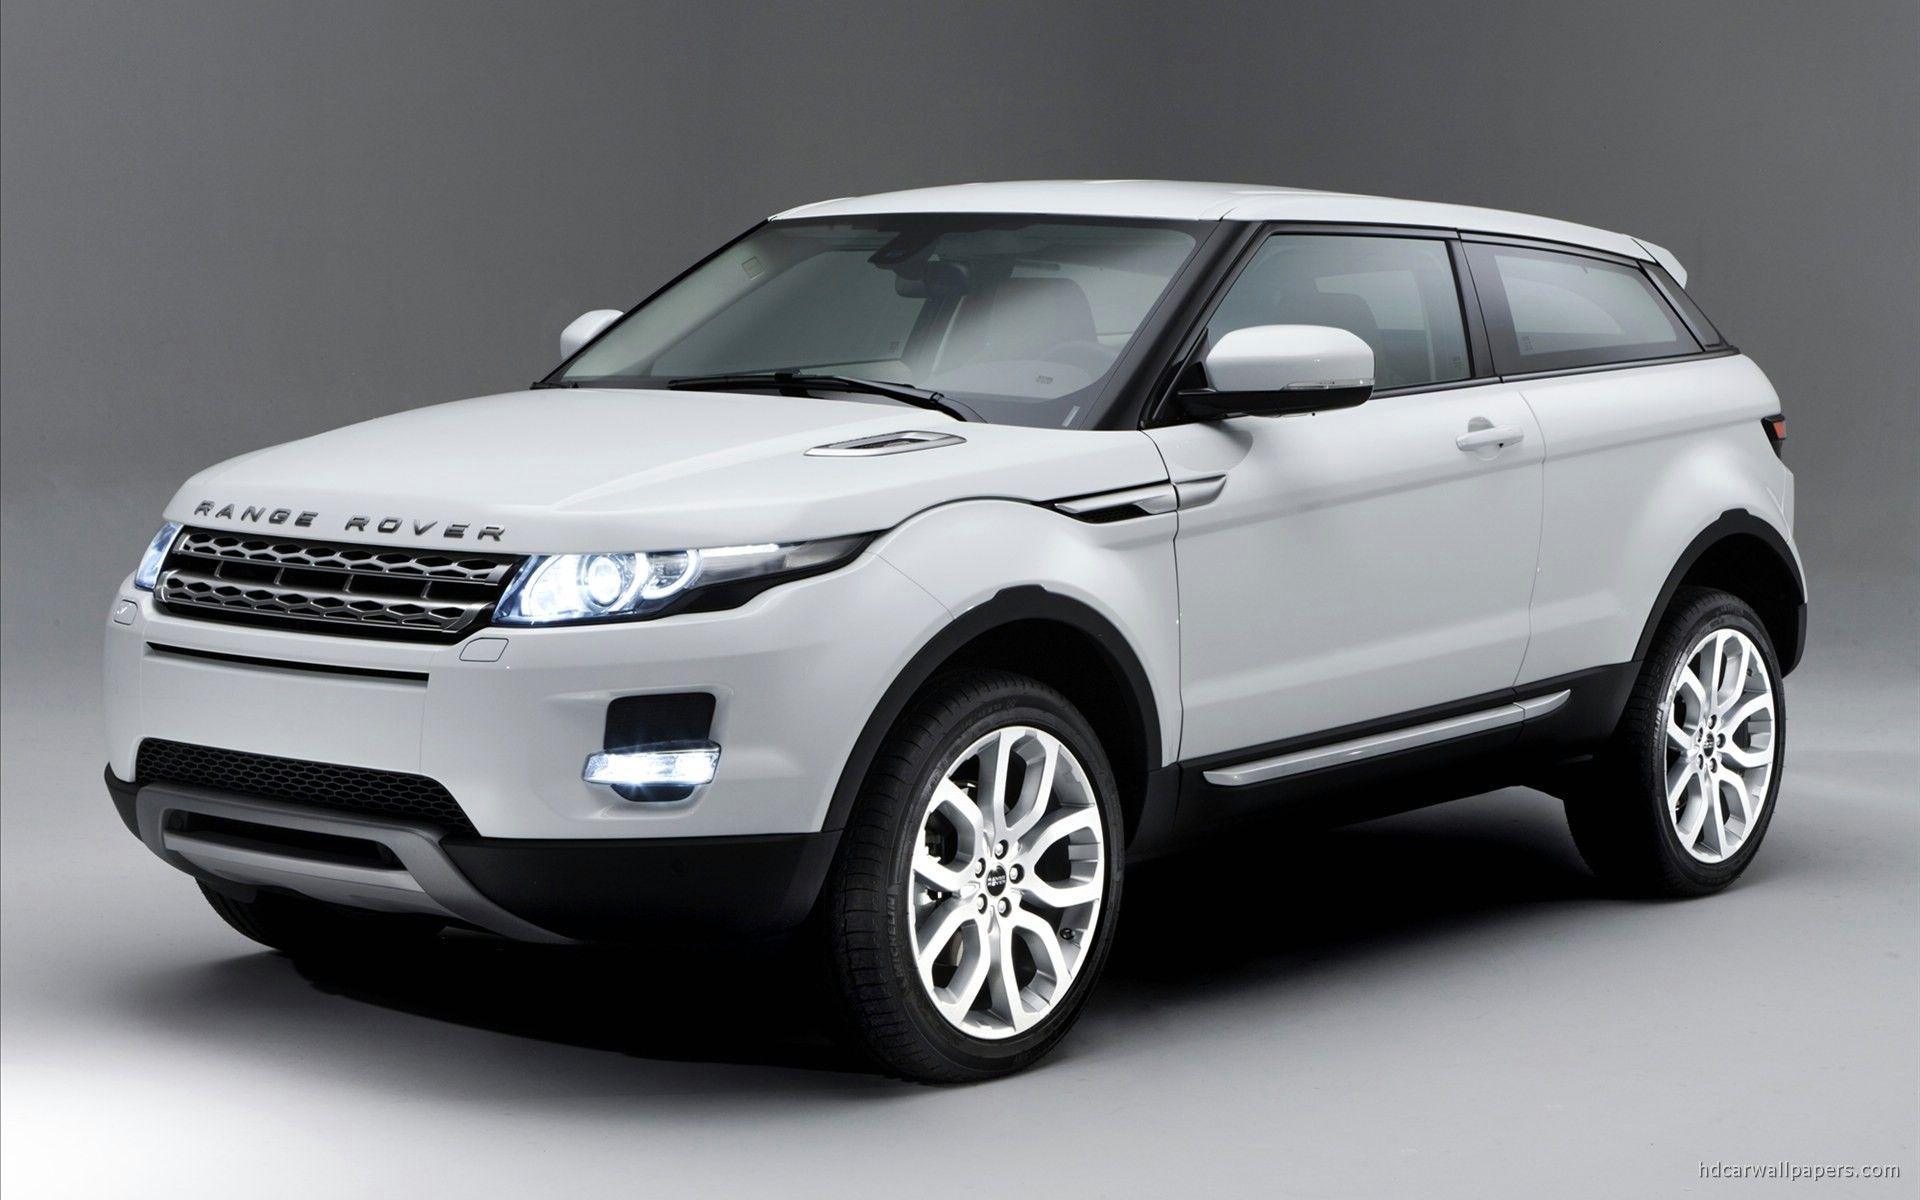 car deals lease landrover land carlease evoque blog uk cheap leasing miami range rover lamoureph